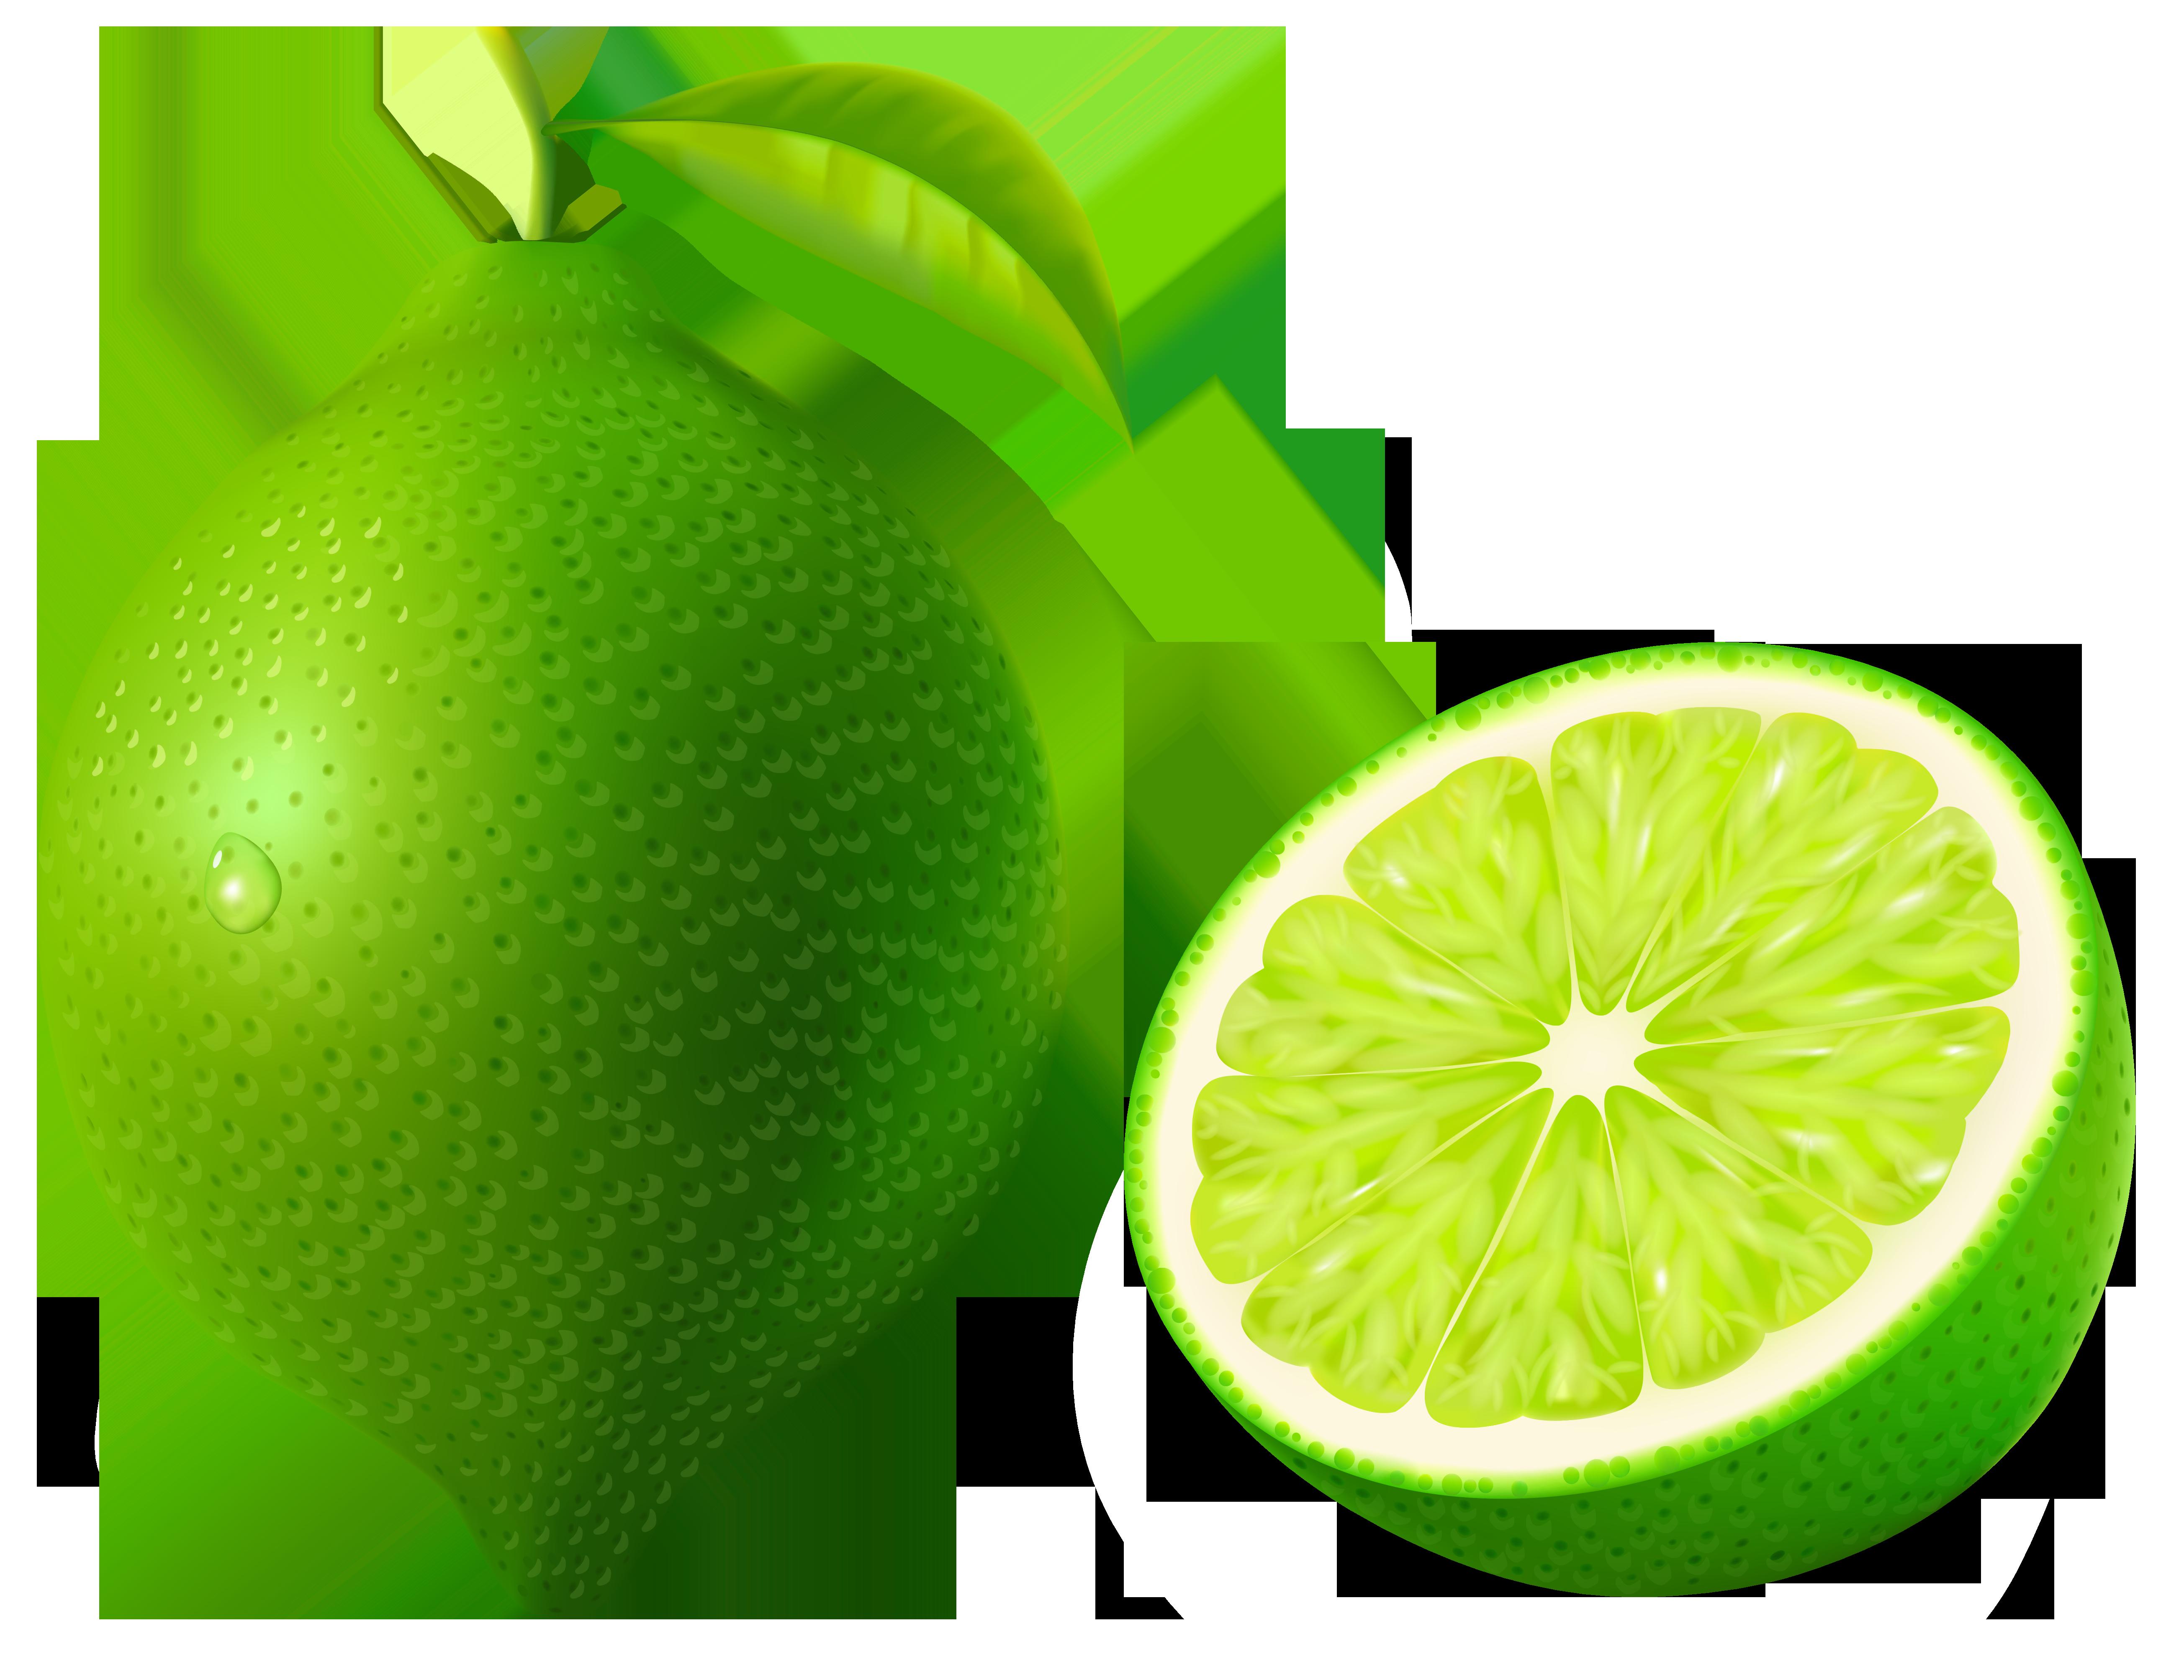 glove winter stickers. Lemons clipart citrus tree